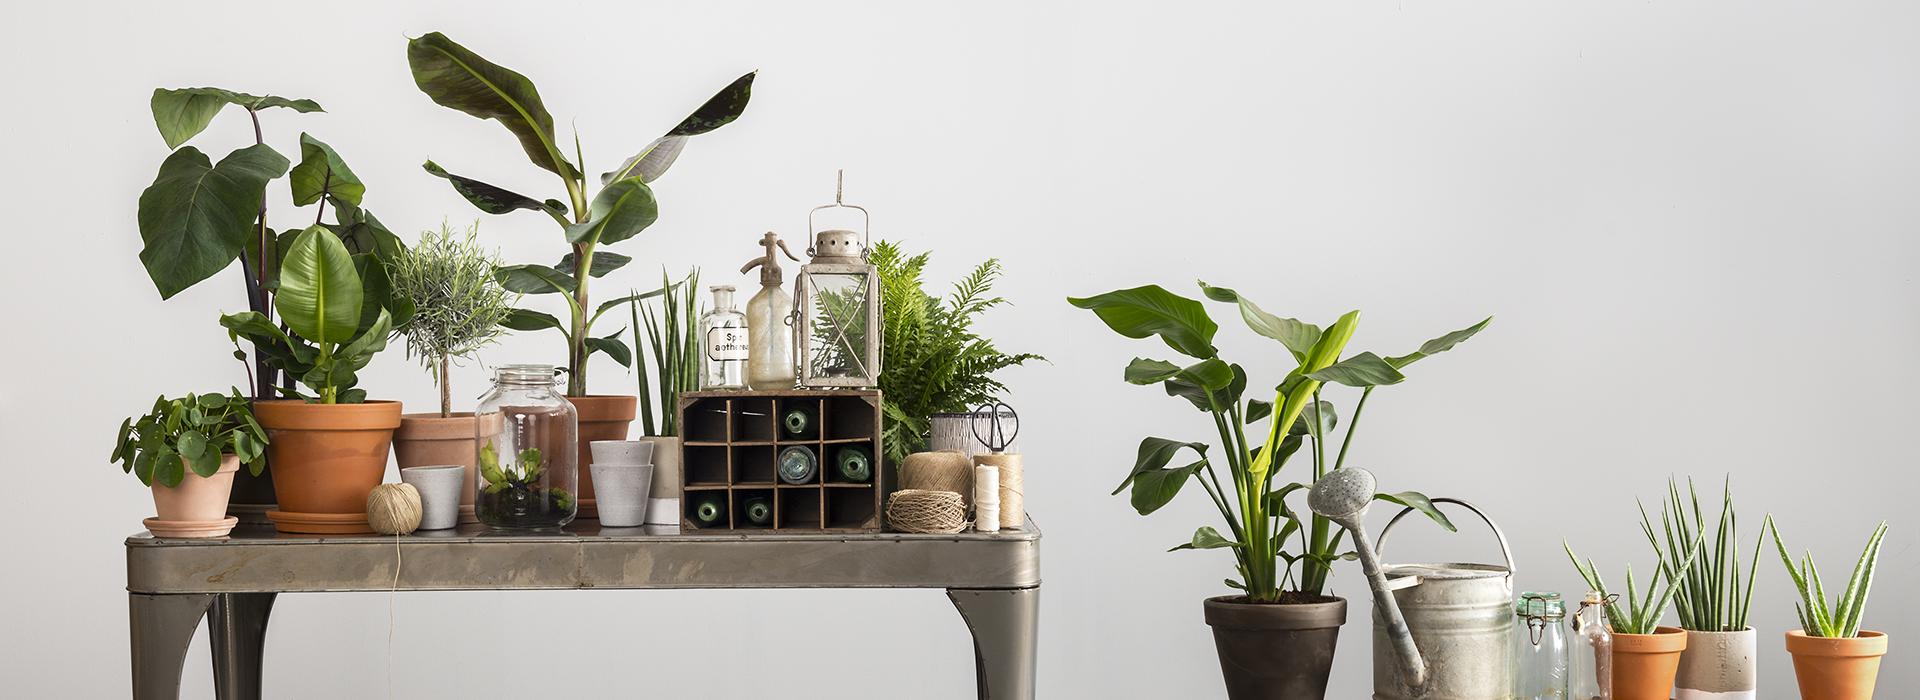 planten potten